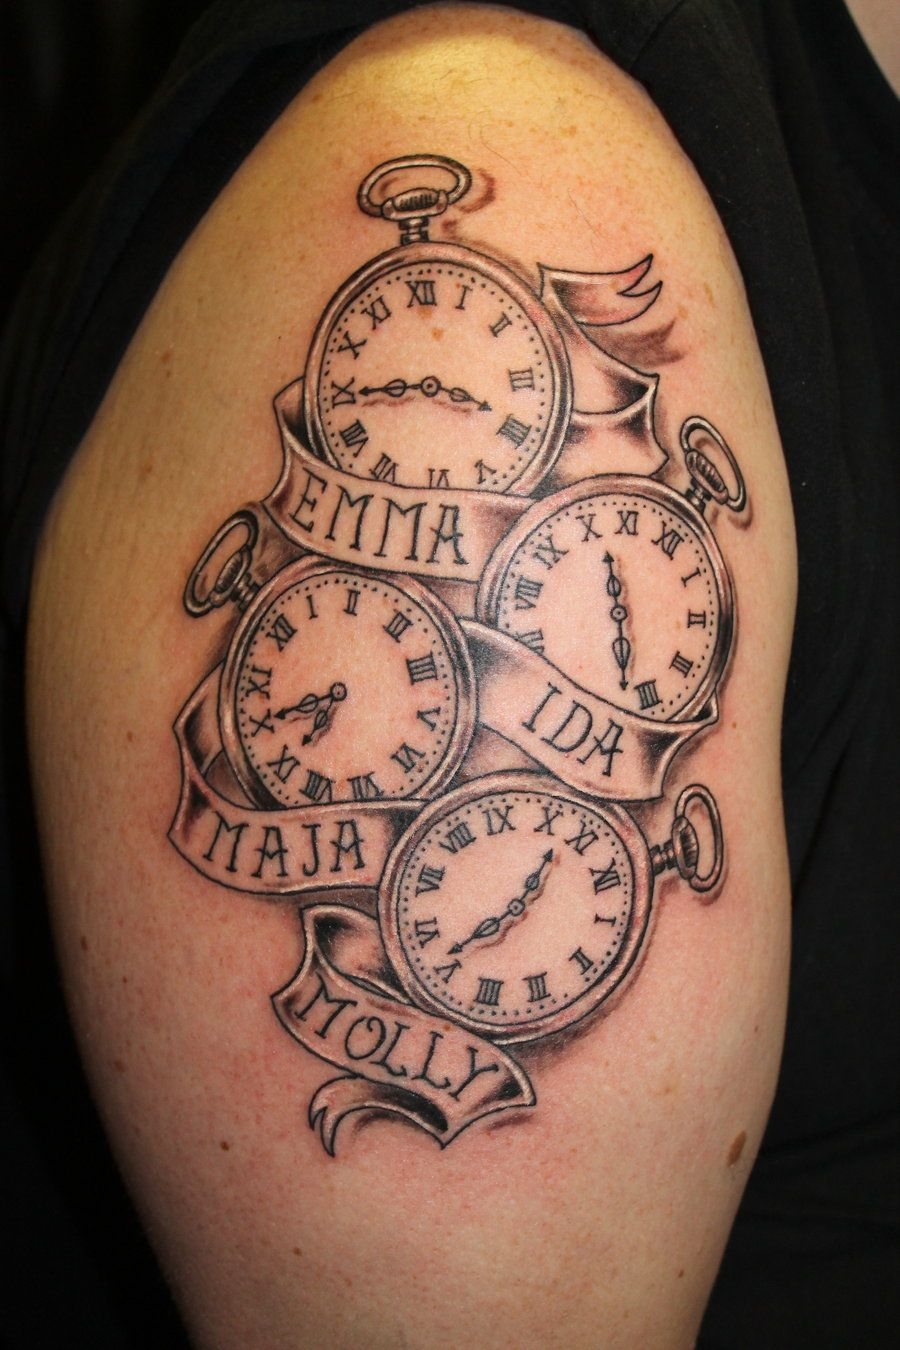 Daughters Name By Torsk1 D5azb2b Jpg 900 1350 Tattoos For Daughters Tattoos For Kids Father Tattoos